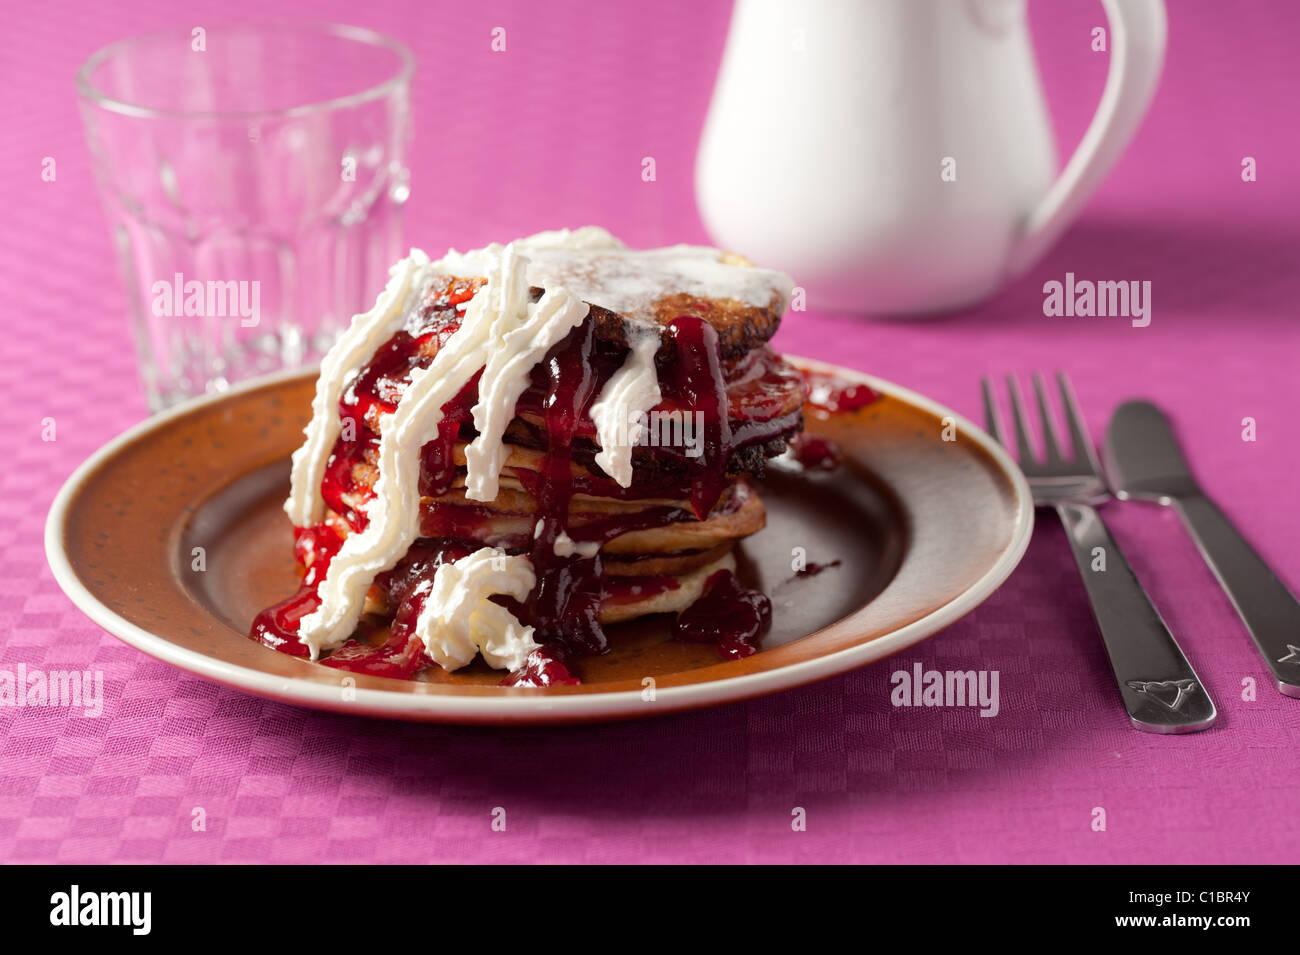 Mess of pancakes - Stock Image